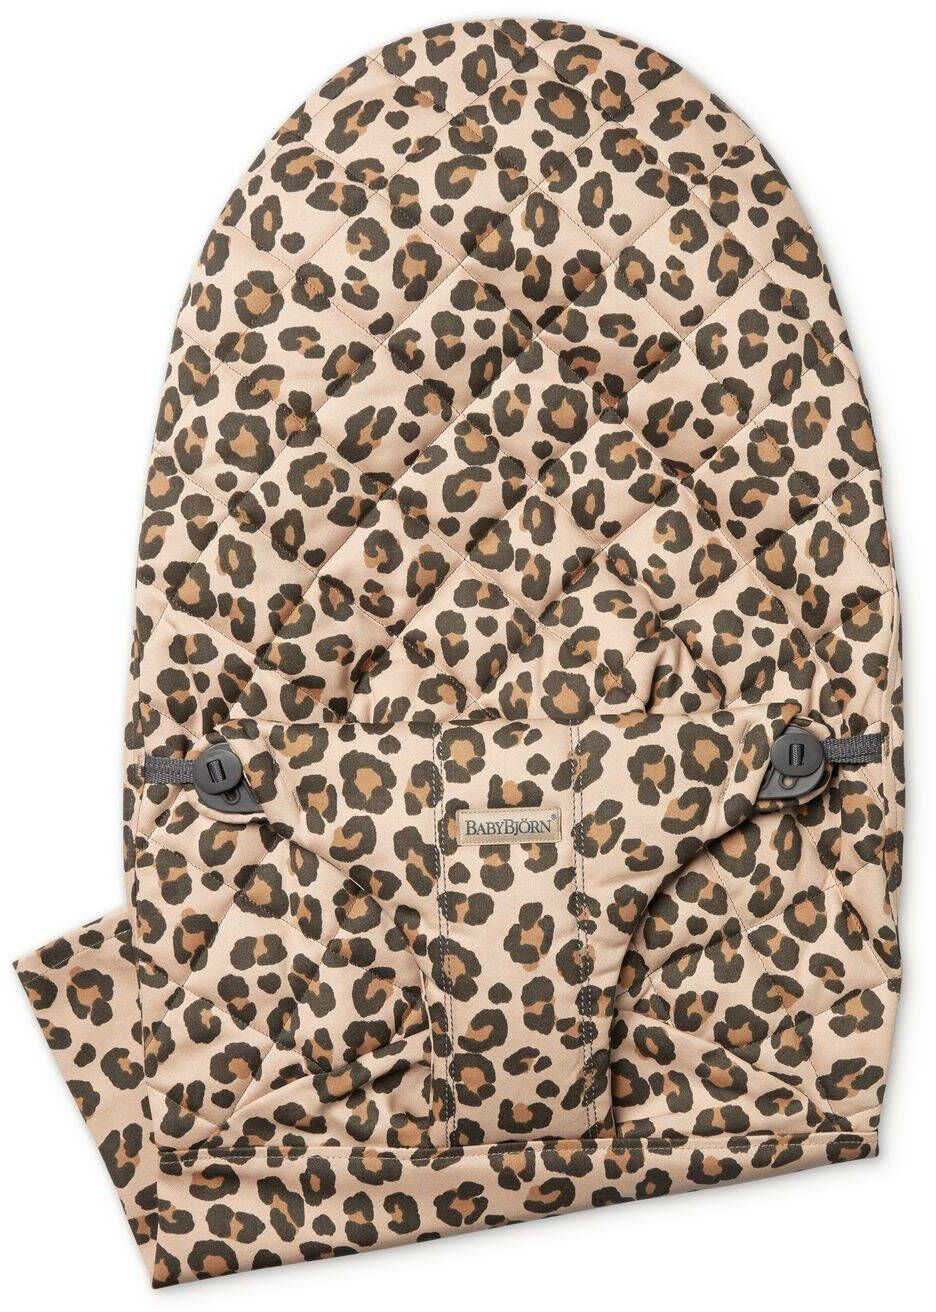 BABYBJORN - poszycie do leżaczka Balance Bliss Beż/Leopard, Cotton